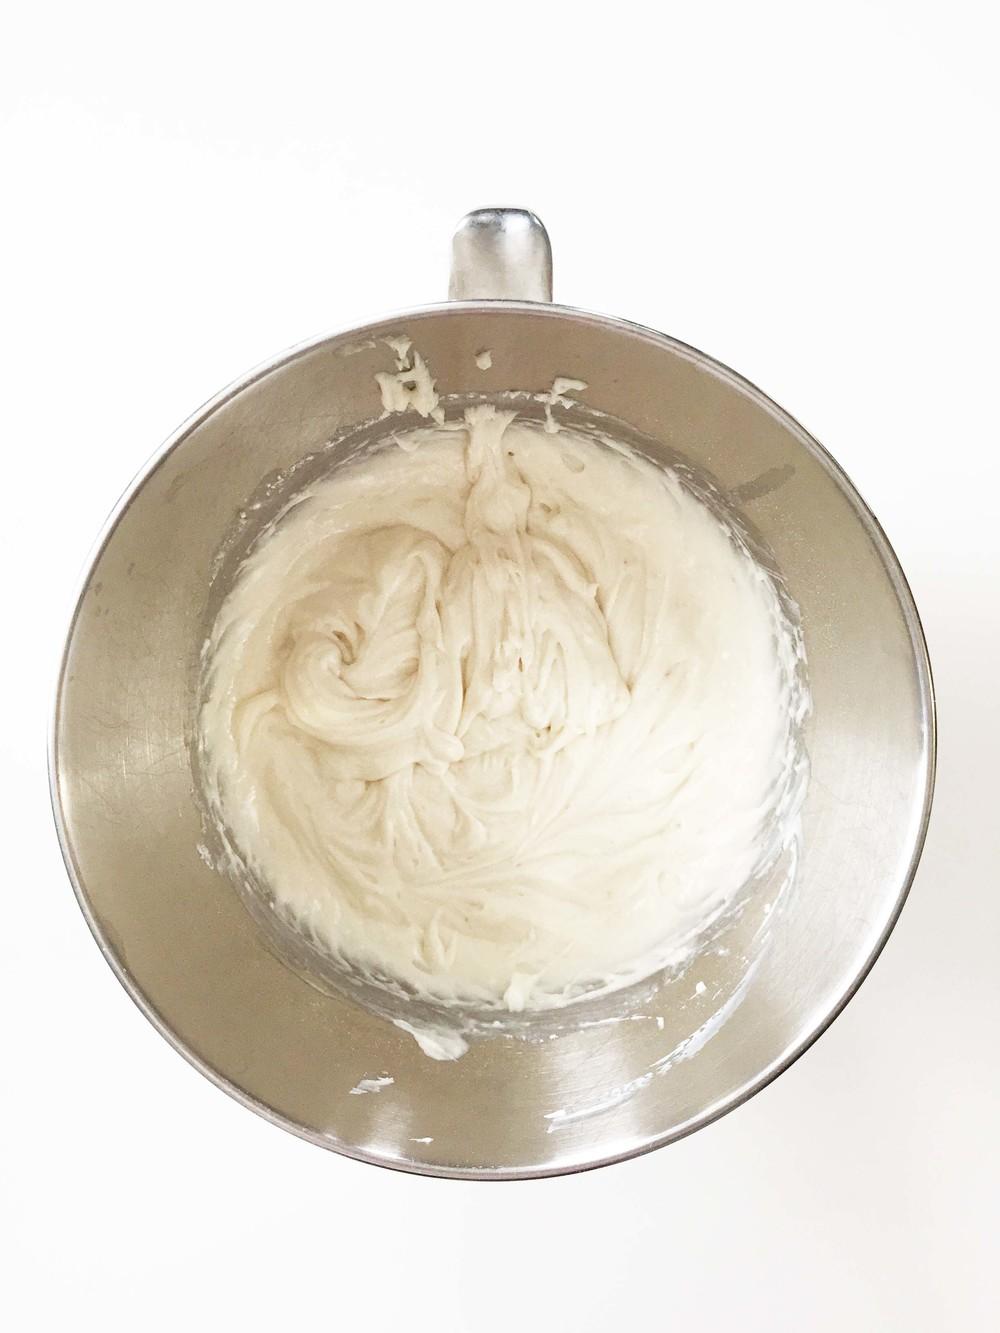 Cake Mix Greek Yogurt Orange Juice